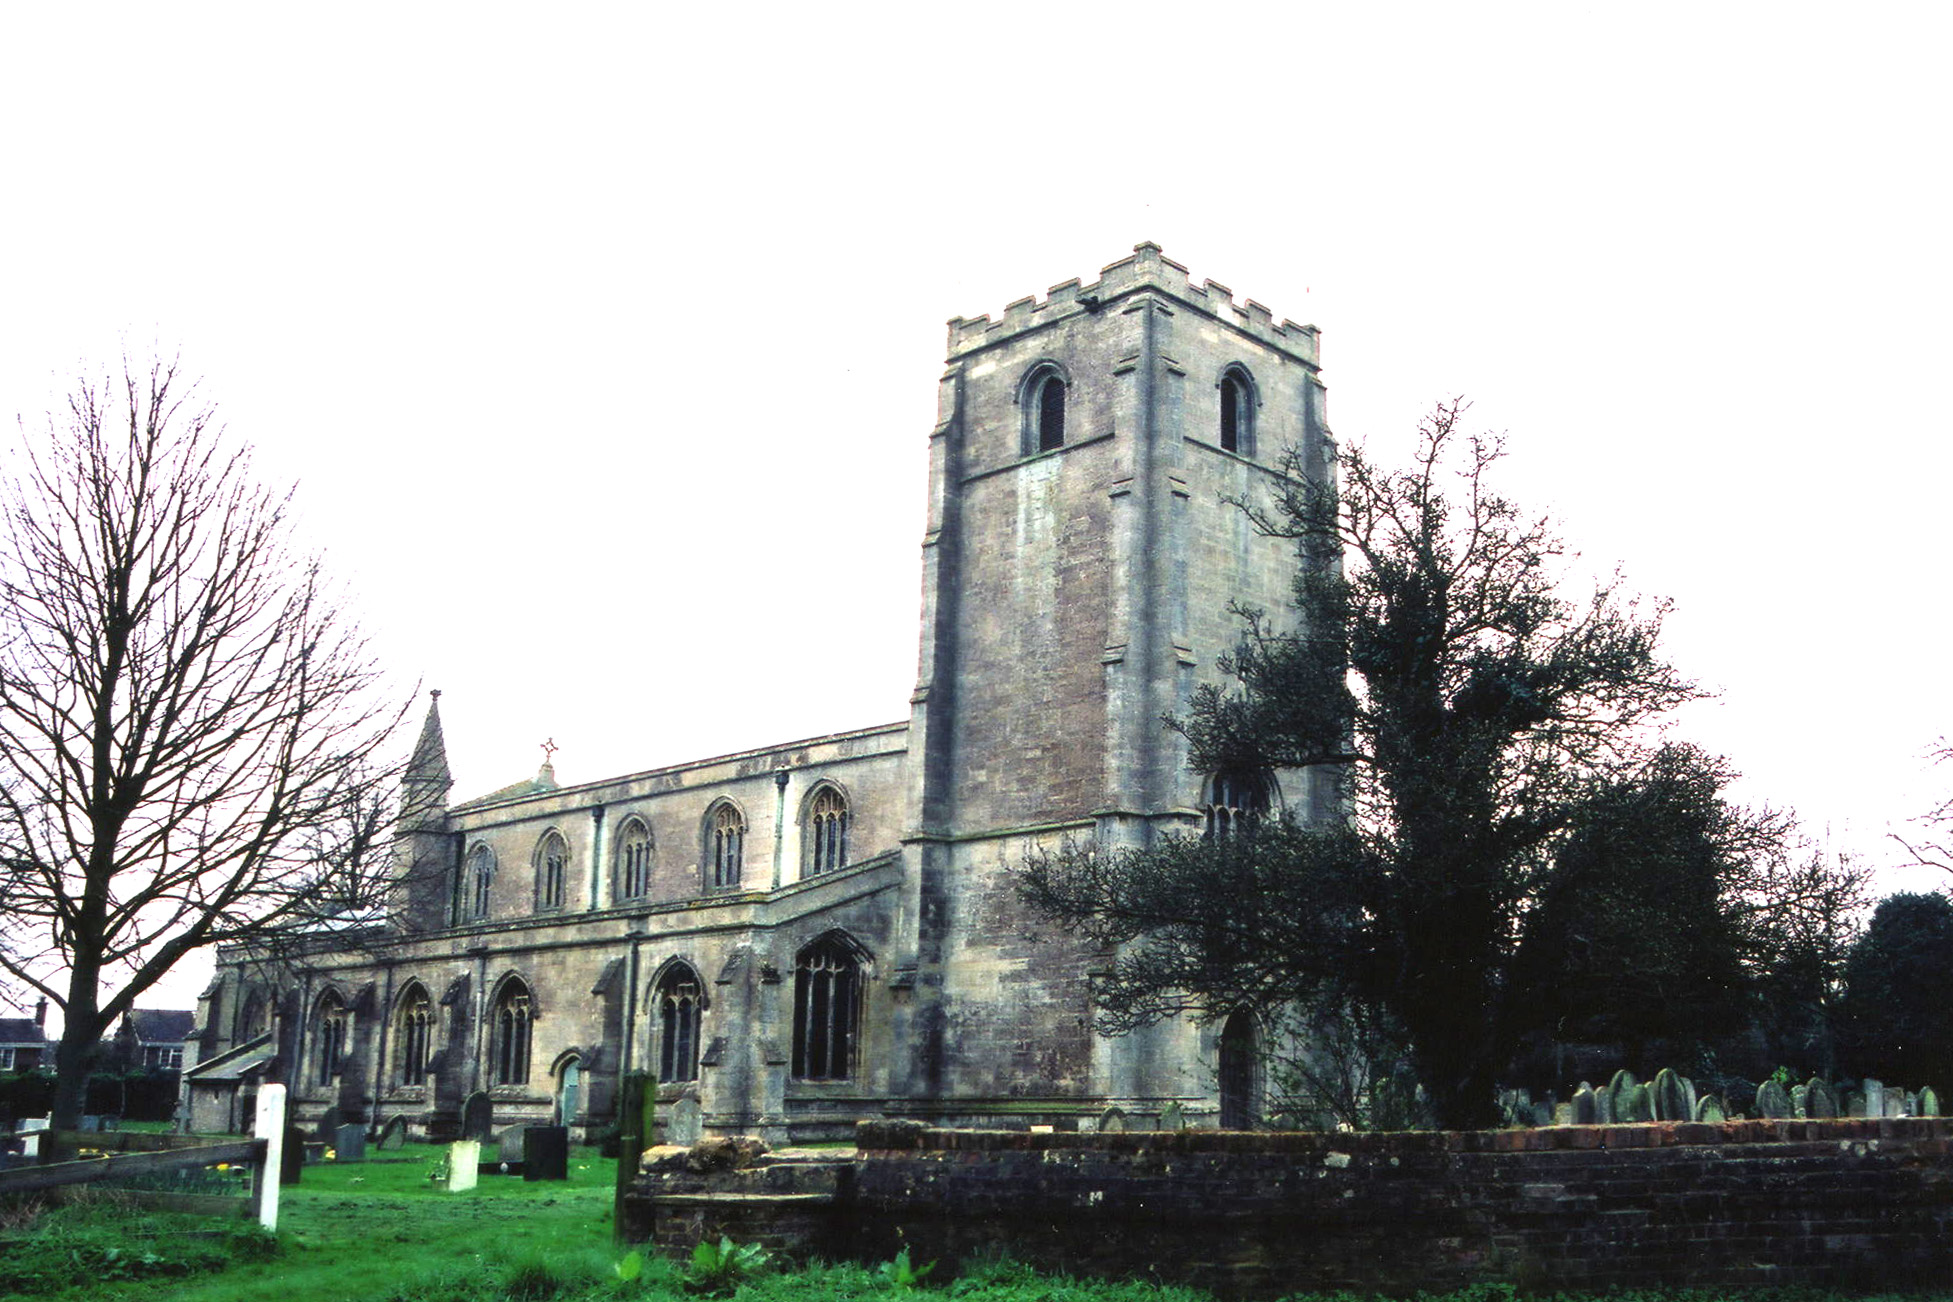 St. Guthlac's Church